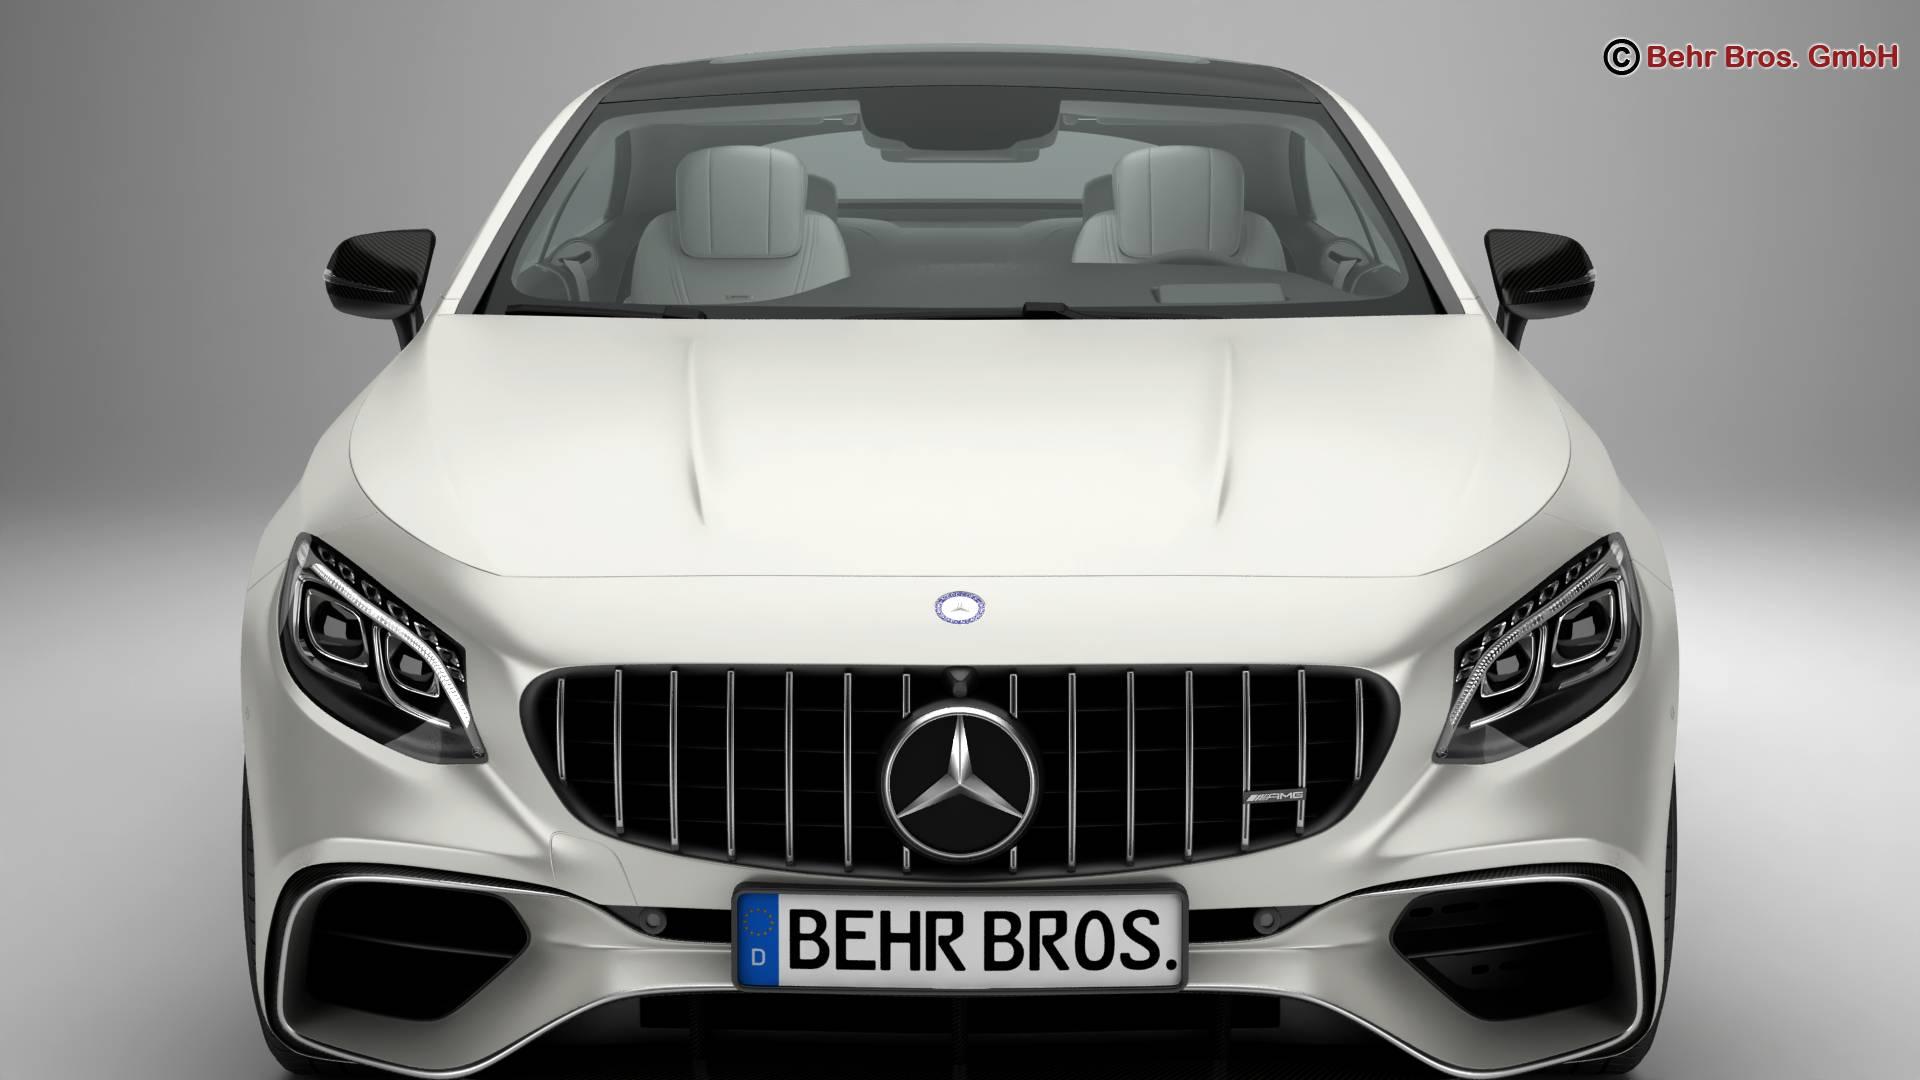 mercedes s class coupe amg s63 2018 3d model 3ds max fbx c4d lwo ma mb obj 274096